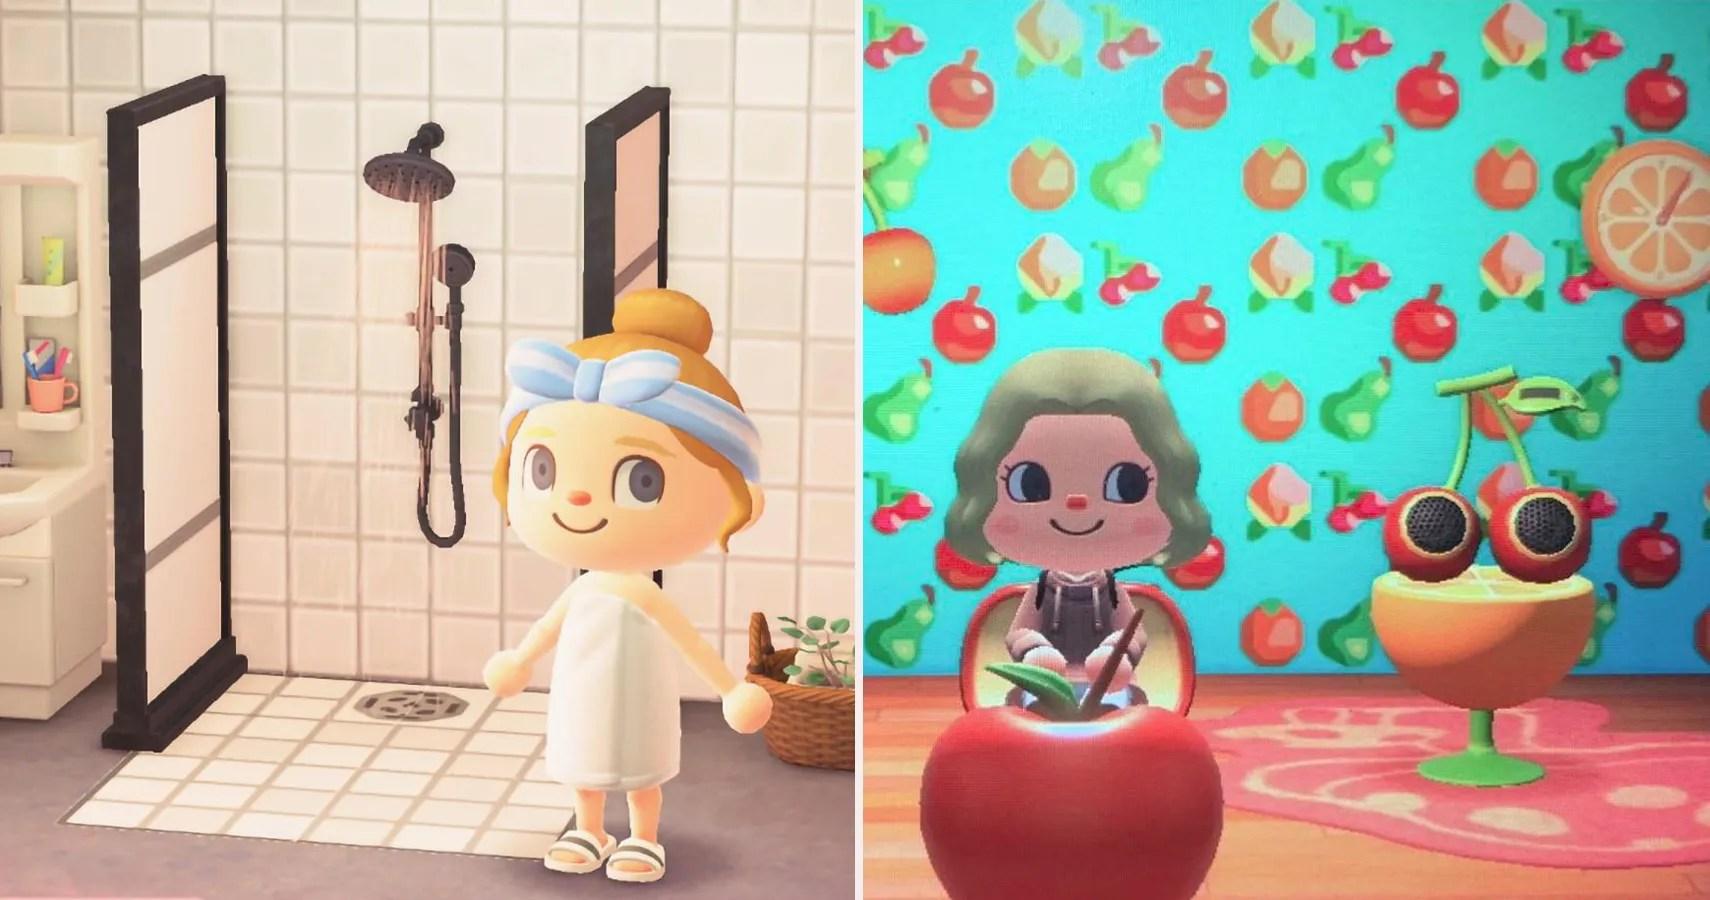 Best Custom Wallpapers In Animal Crossing New Horizons